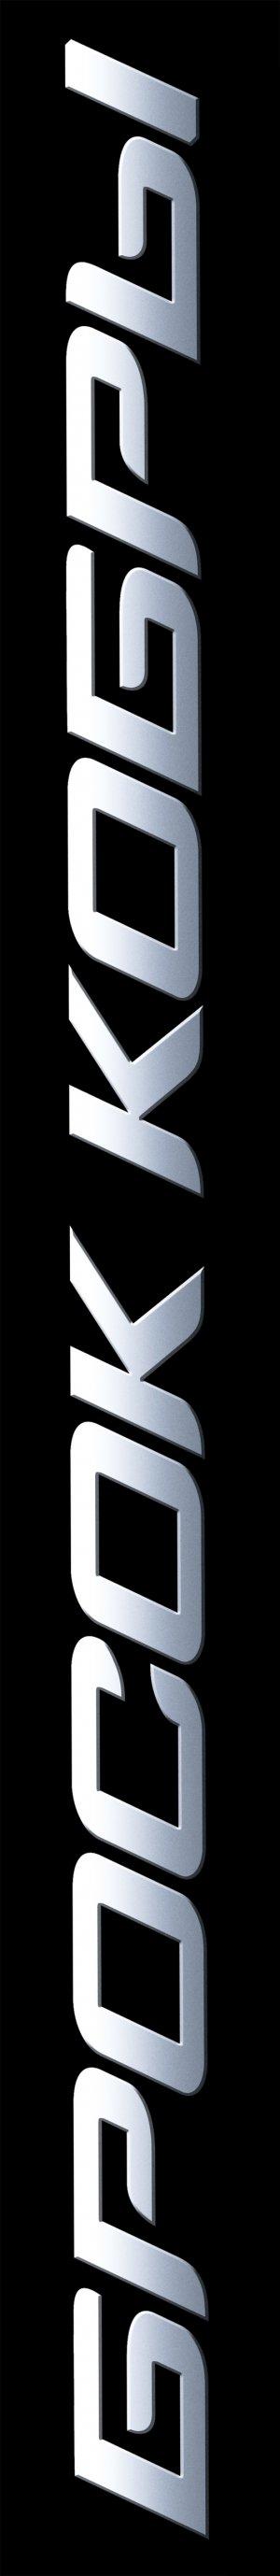 G.I. Joe: The Rise of Cobra 544x5000